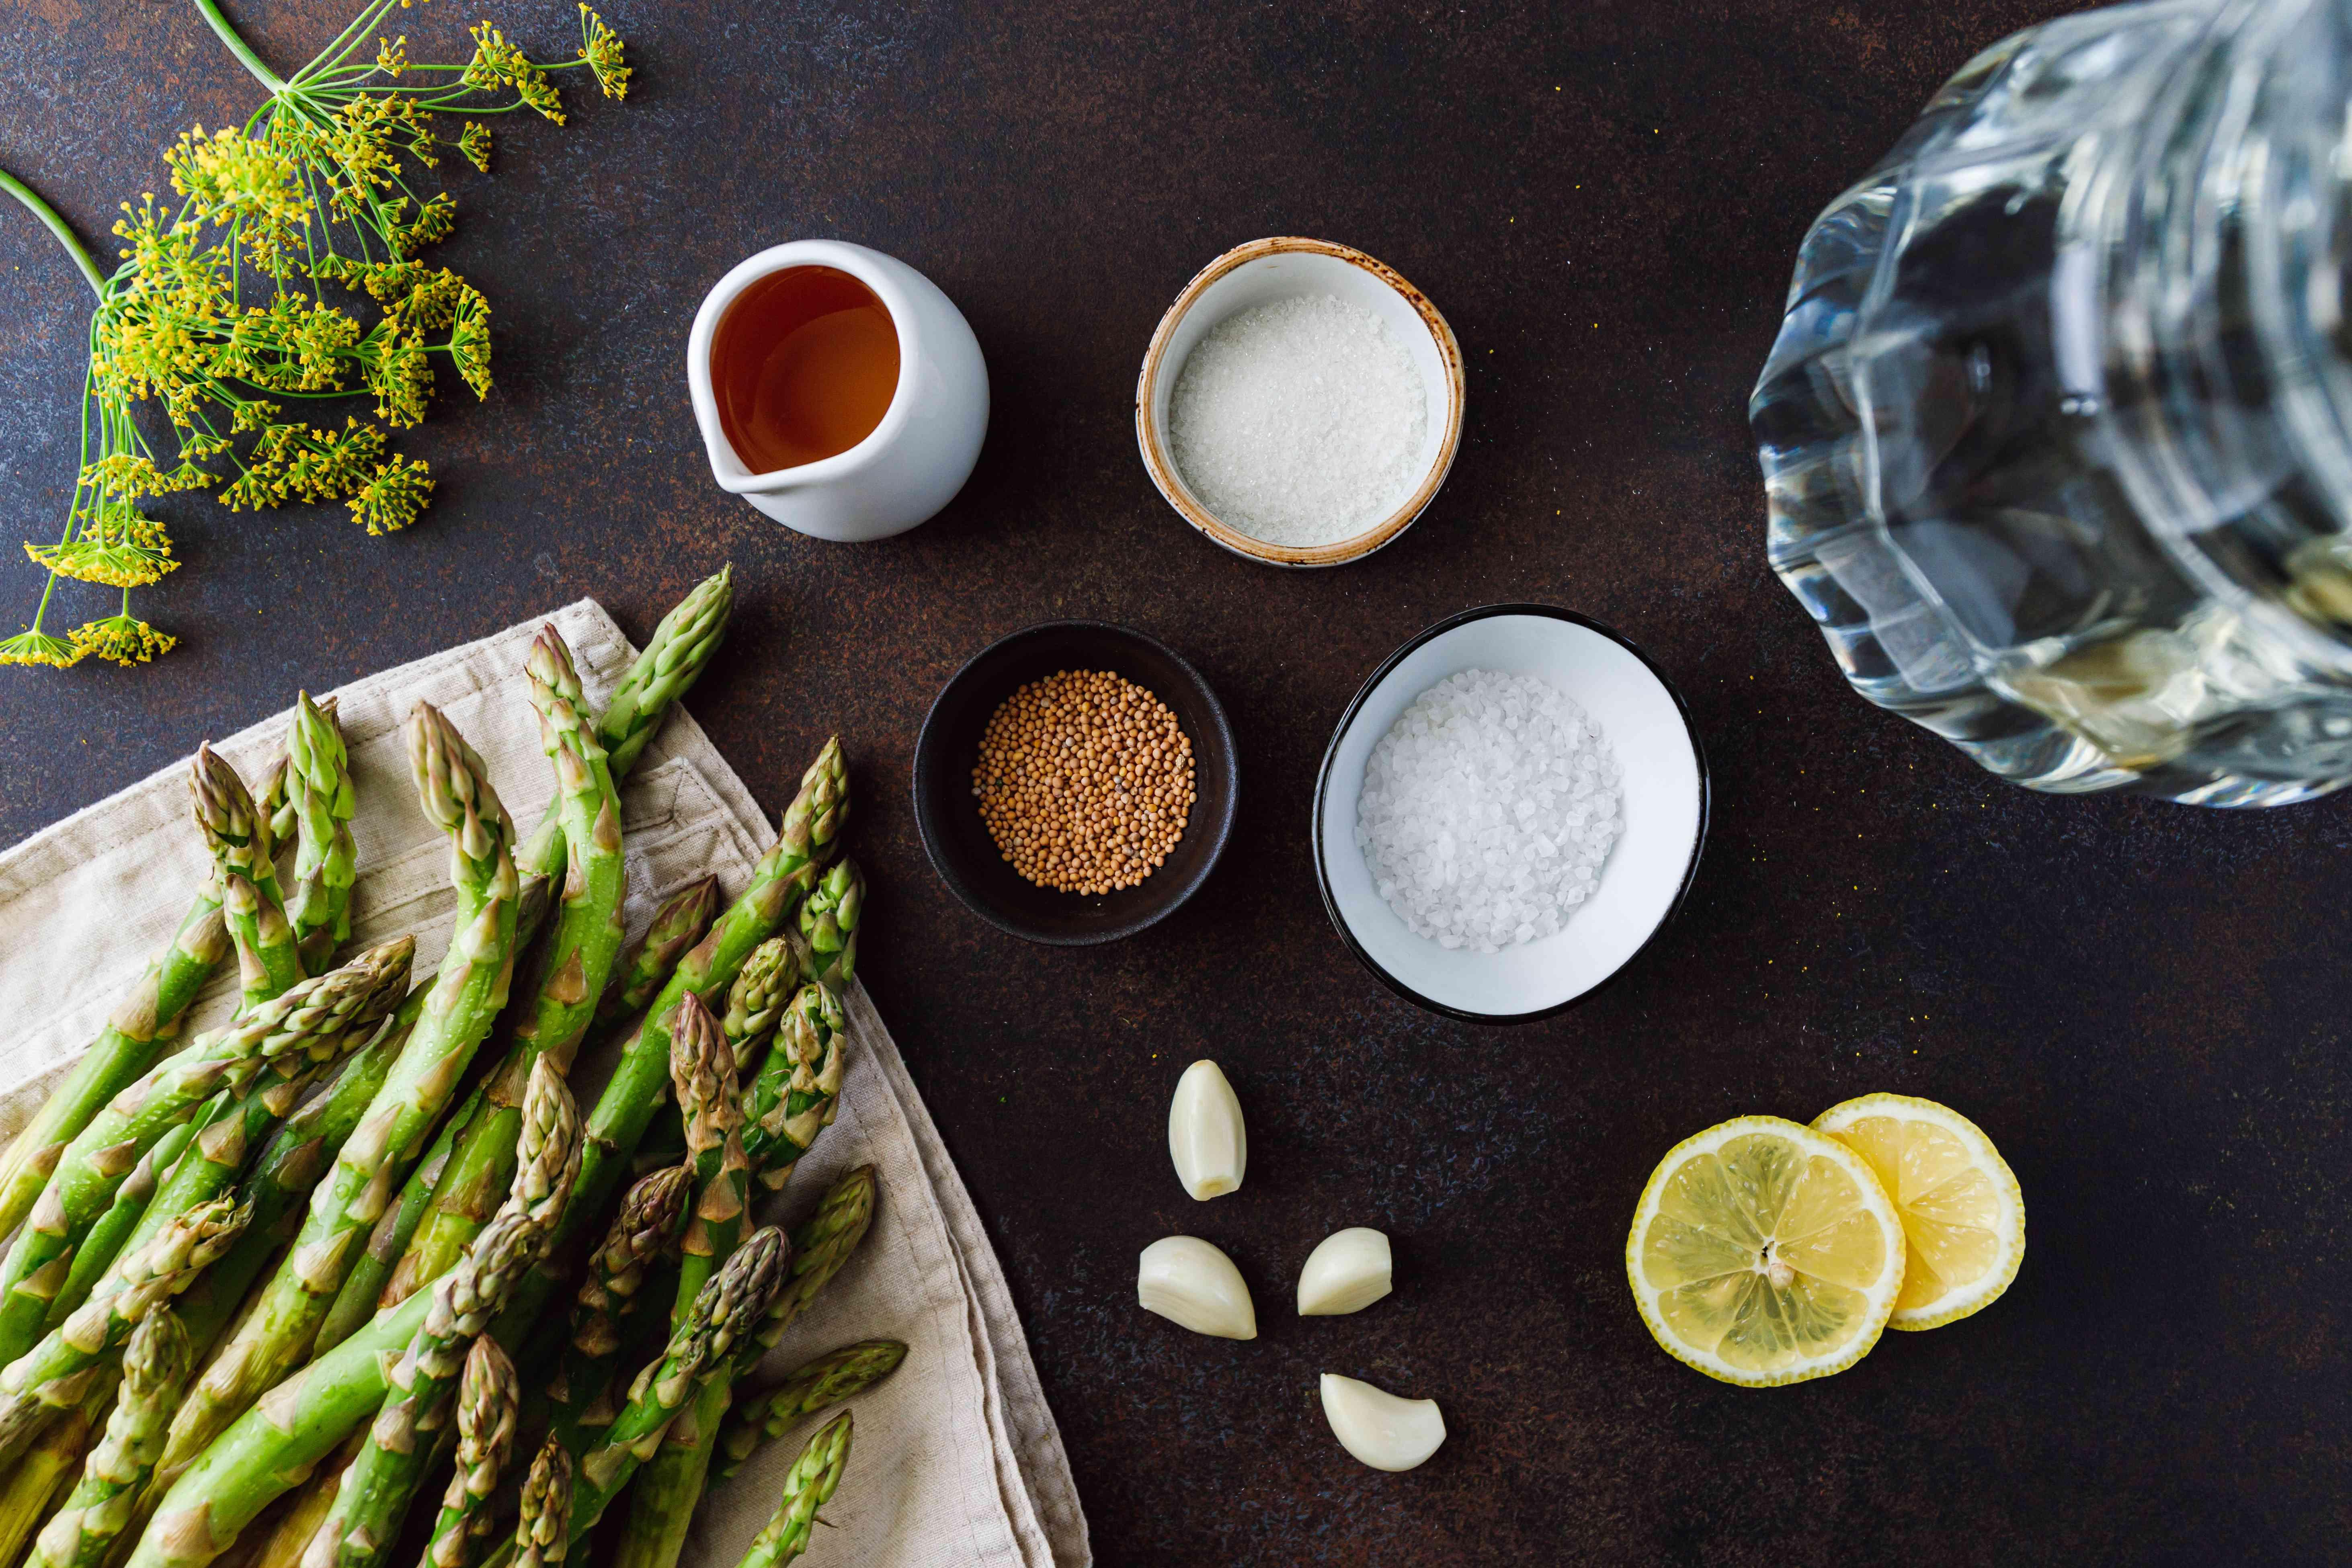 Ingredients for asparagus refrigerator pickled recipe